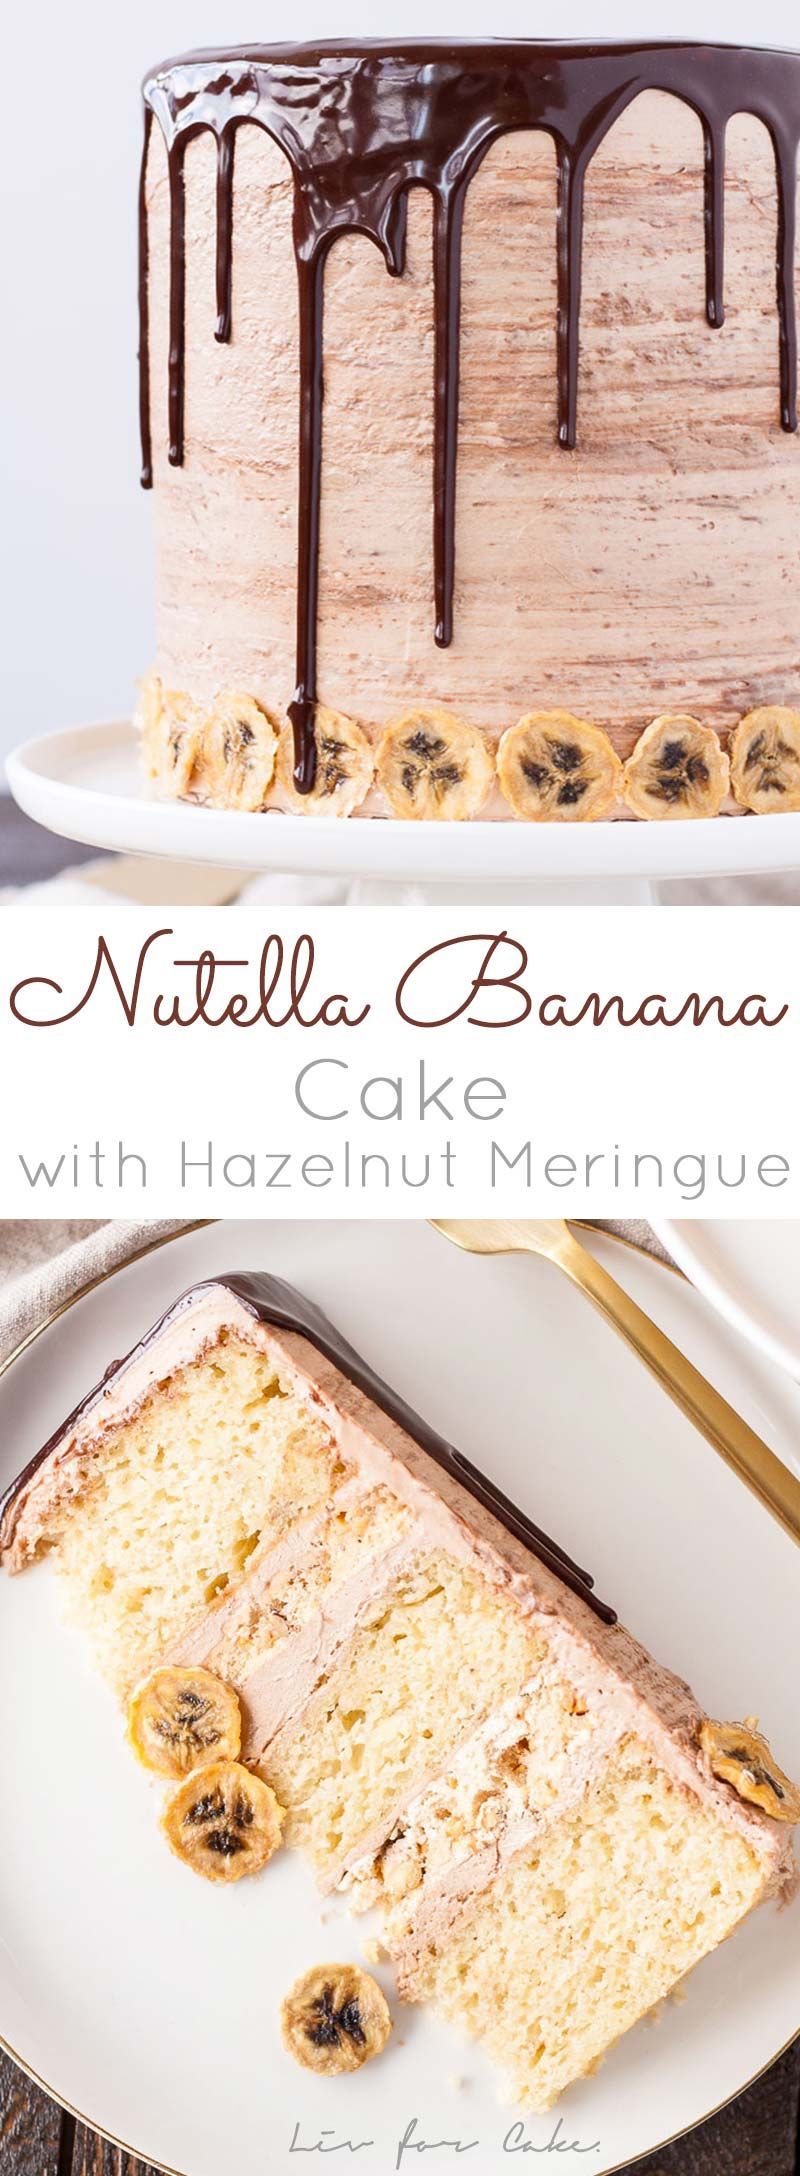 Layers of fluffy banana cake, silky Nutella buttercream, and crunchy hazelnut meringue. | livforcake.com